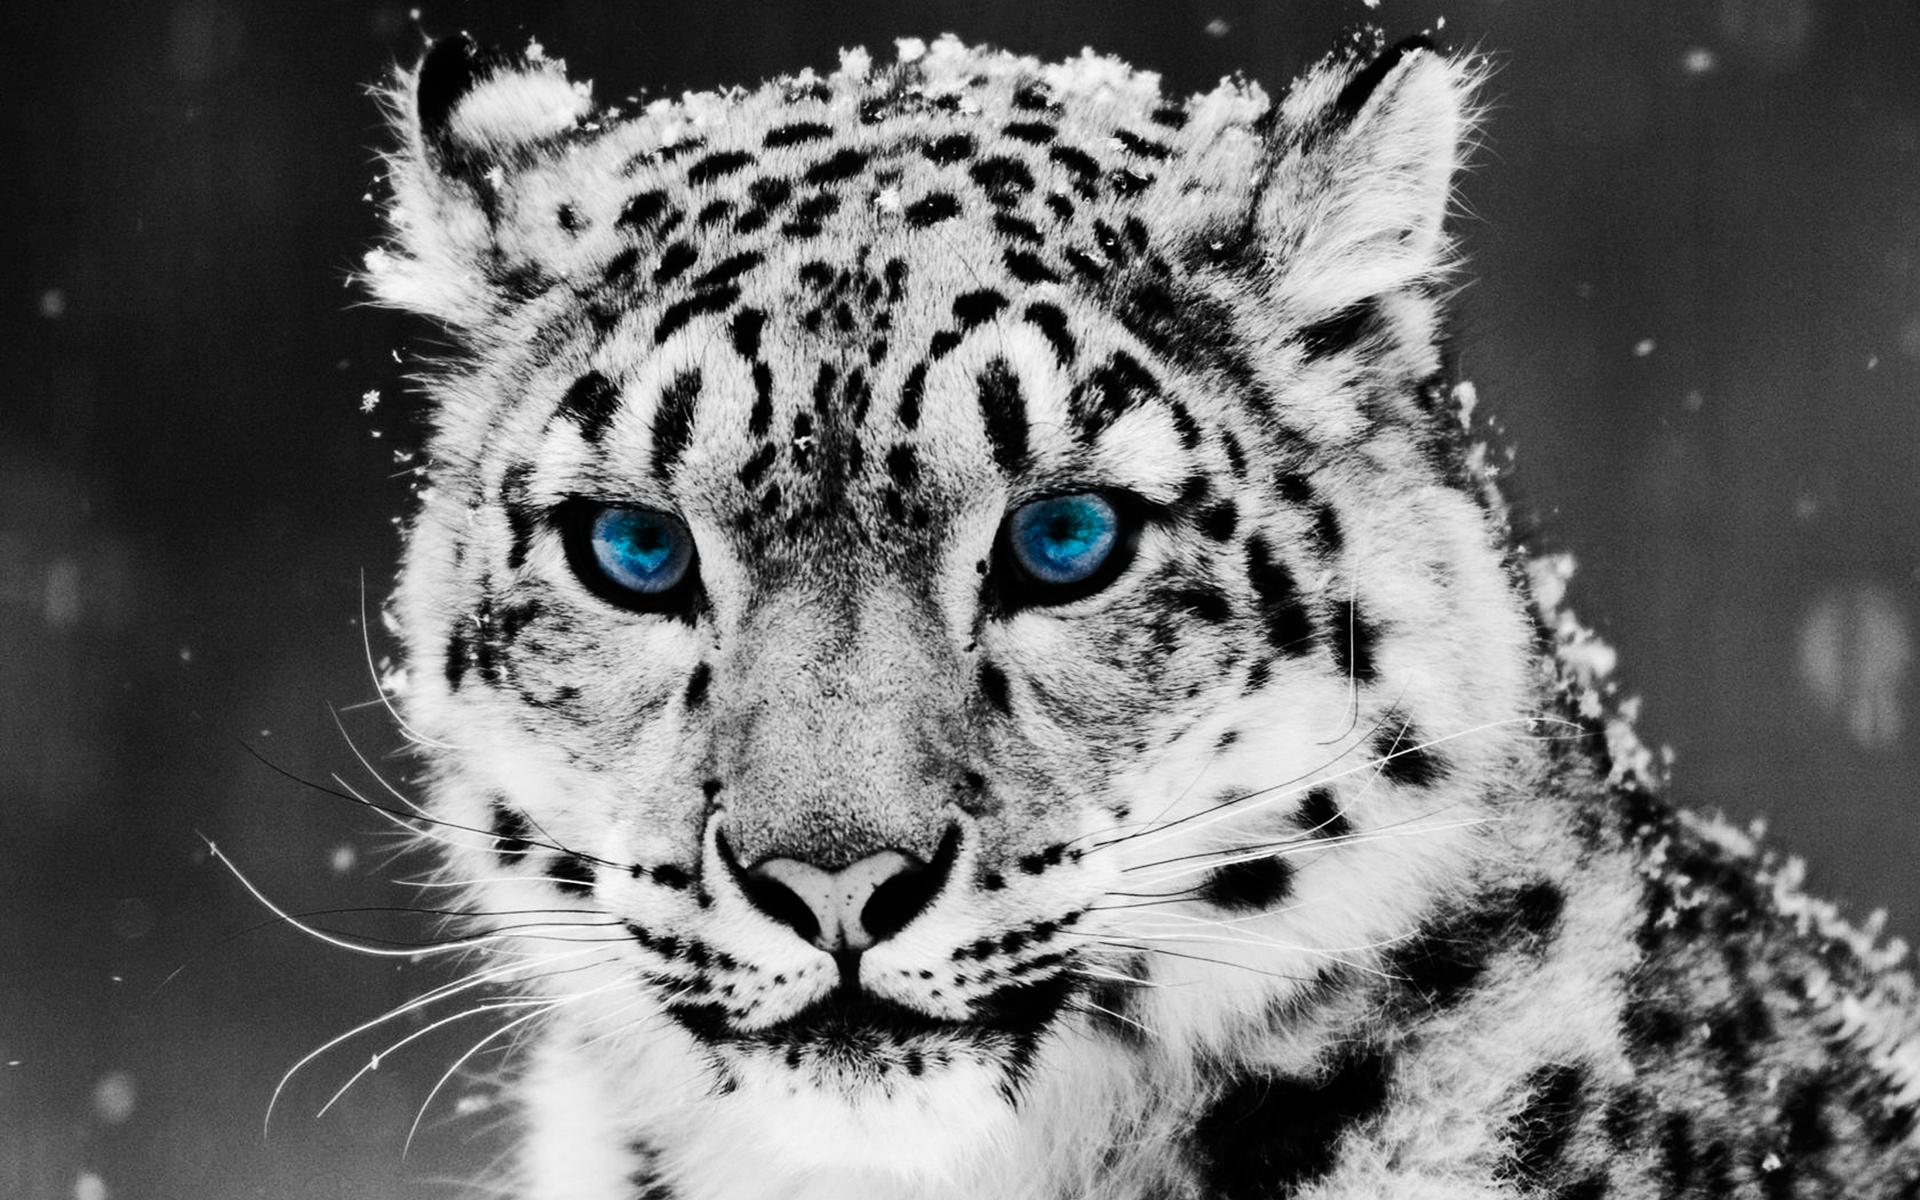 Животные - Snow Leopard  - Stane - Панда - Кот - Not Tiger - Бетмен - дорога - Милые - Haski - Тигр - Tapeta - Металлика - Рождество Обои